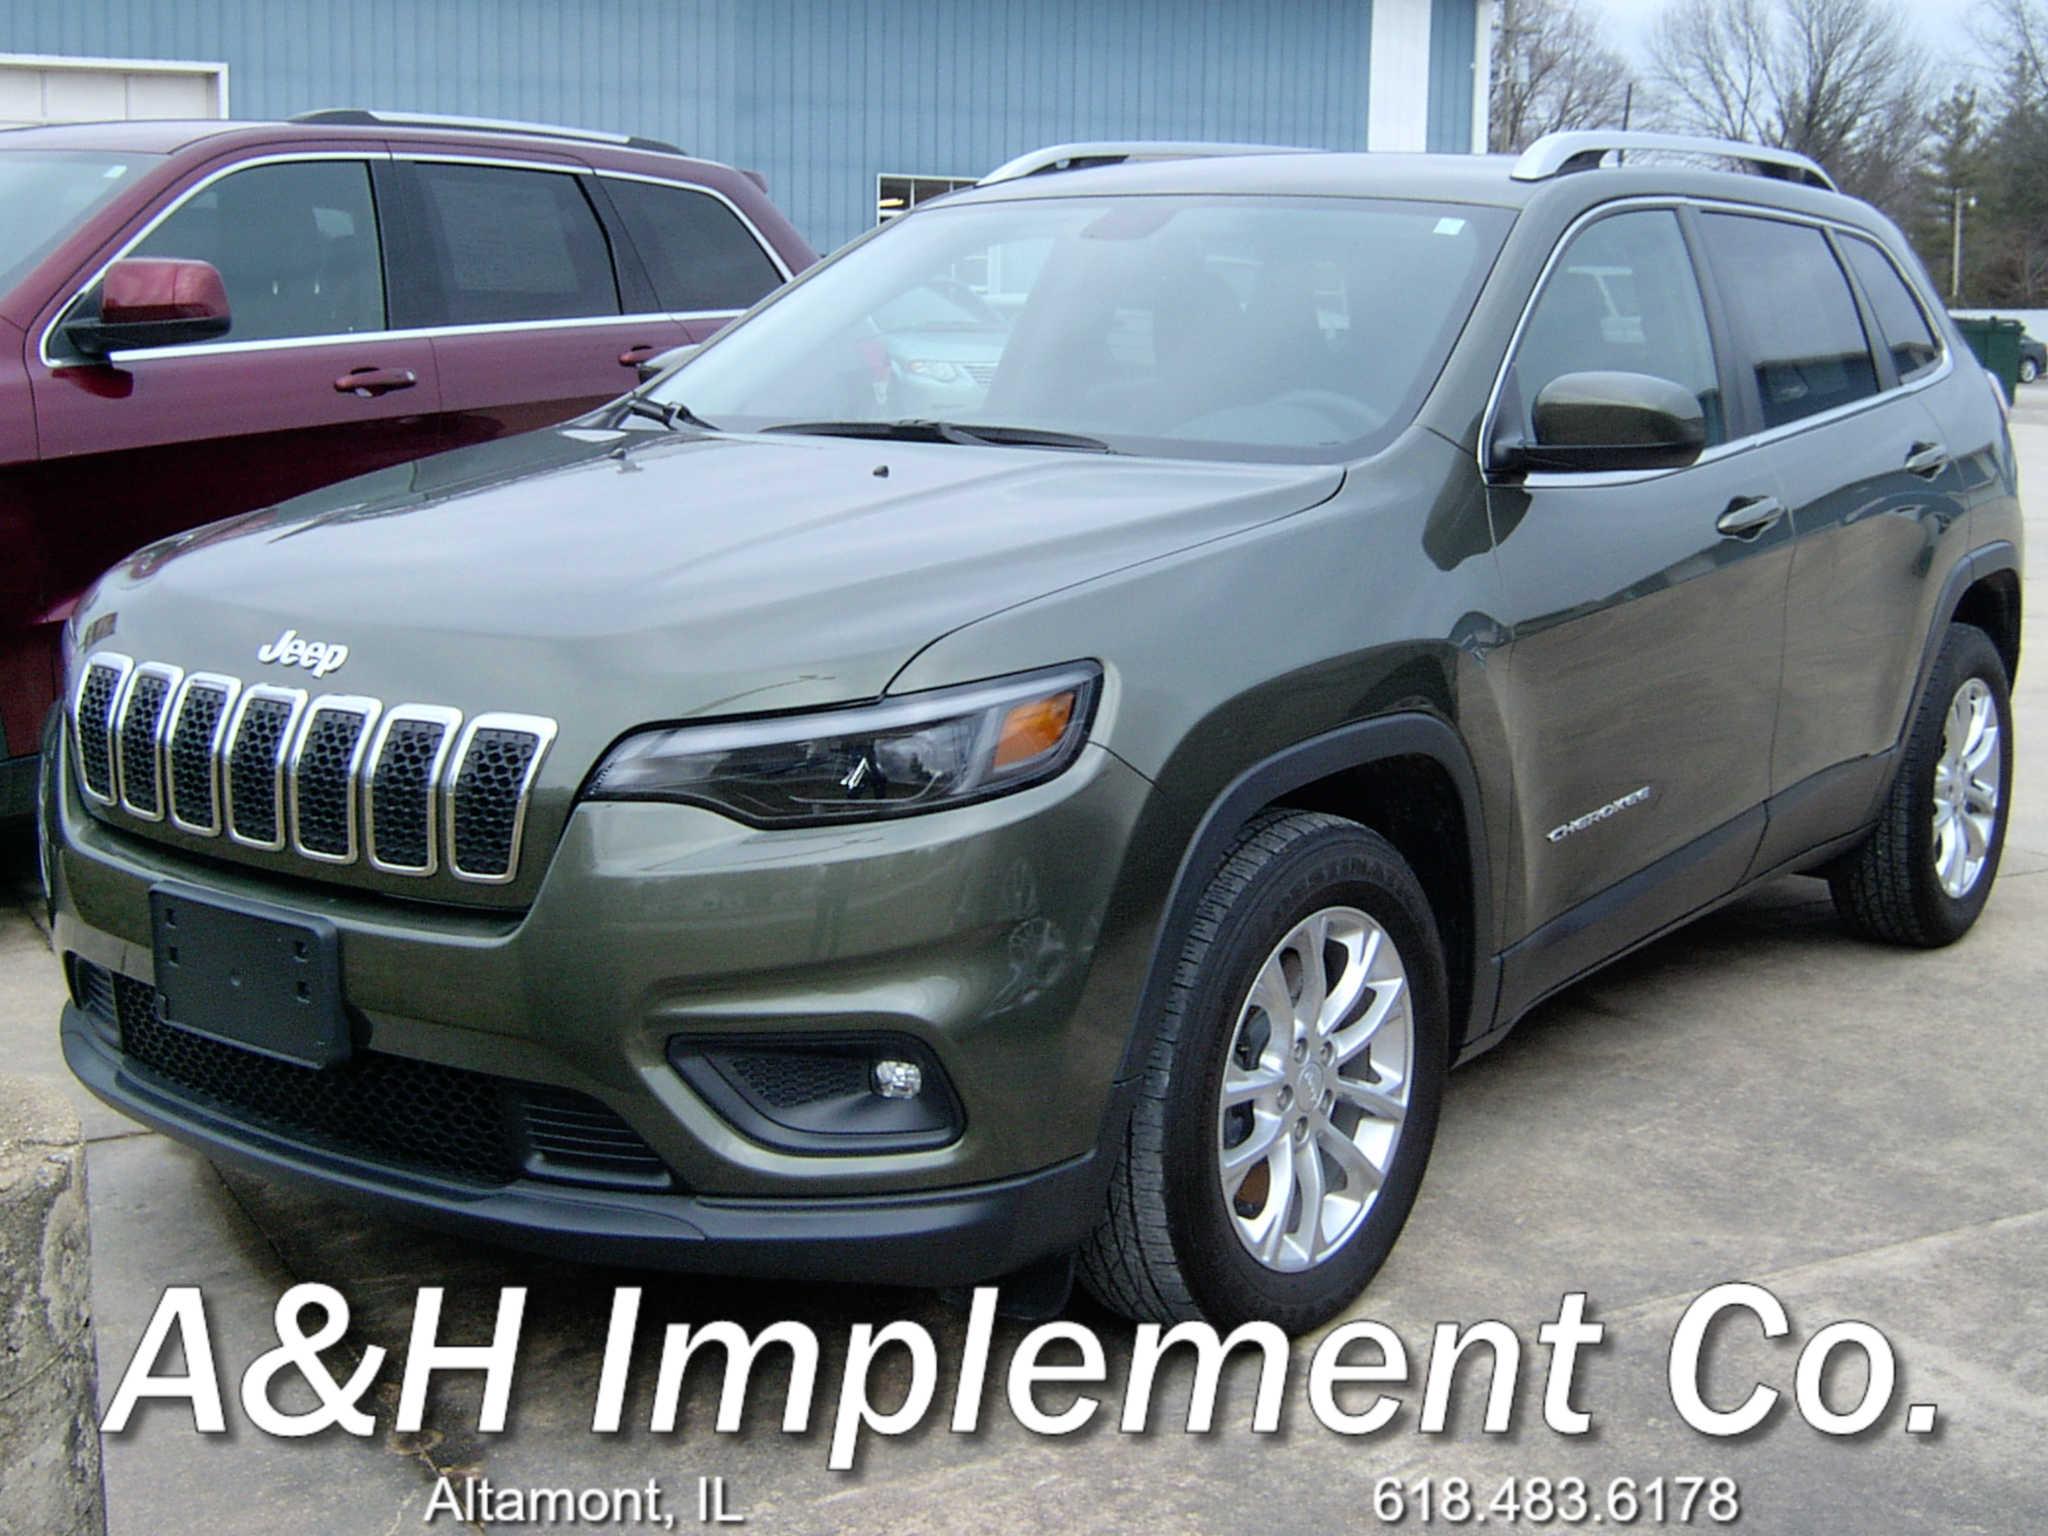 2019 Jeep Cherokee Latitude - Green 1